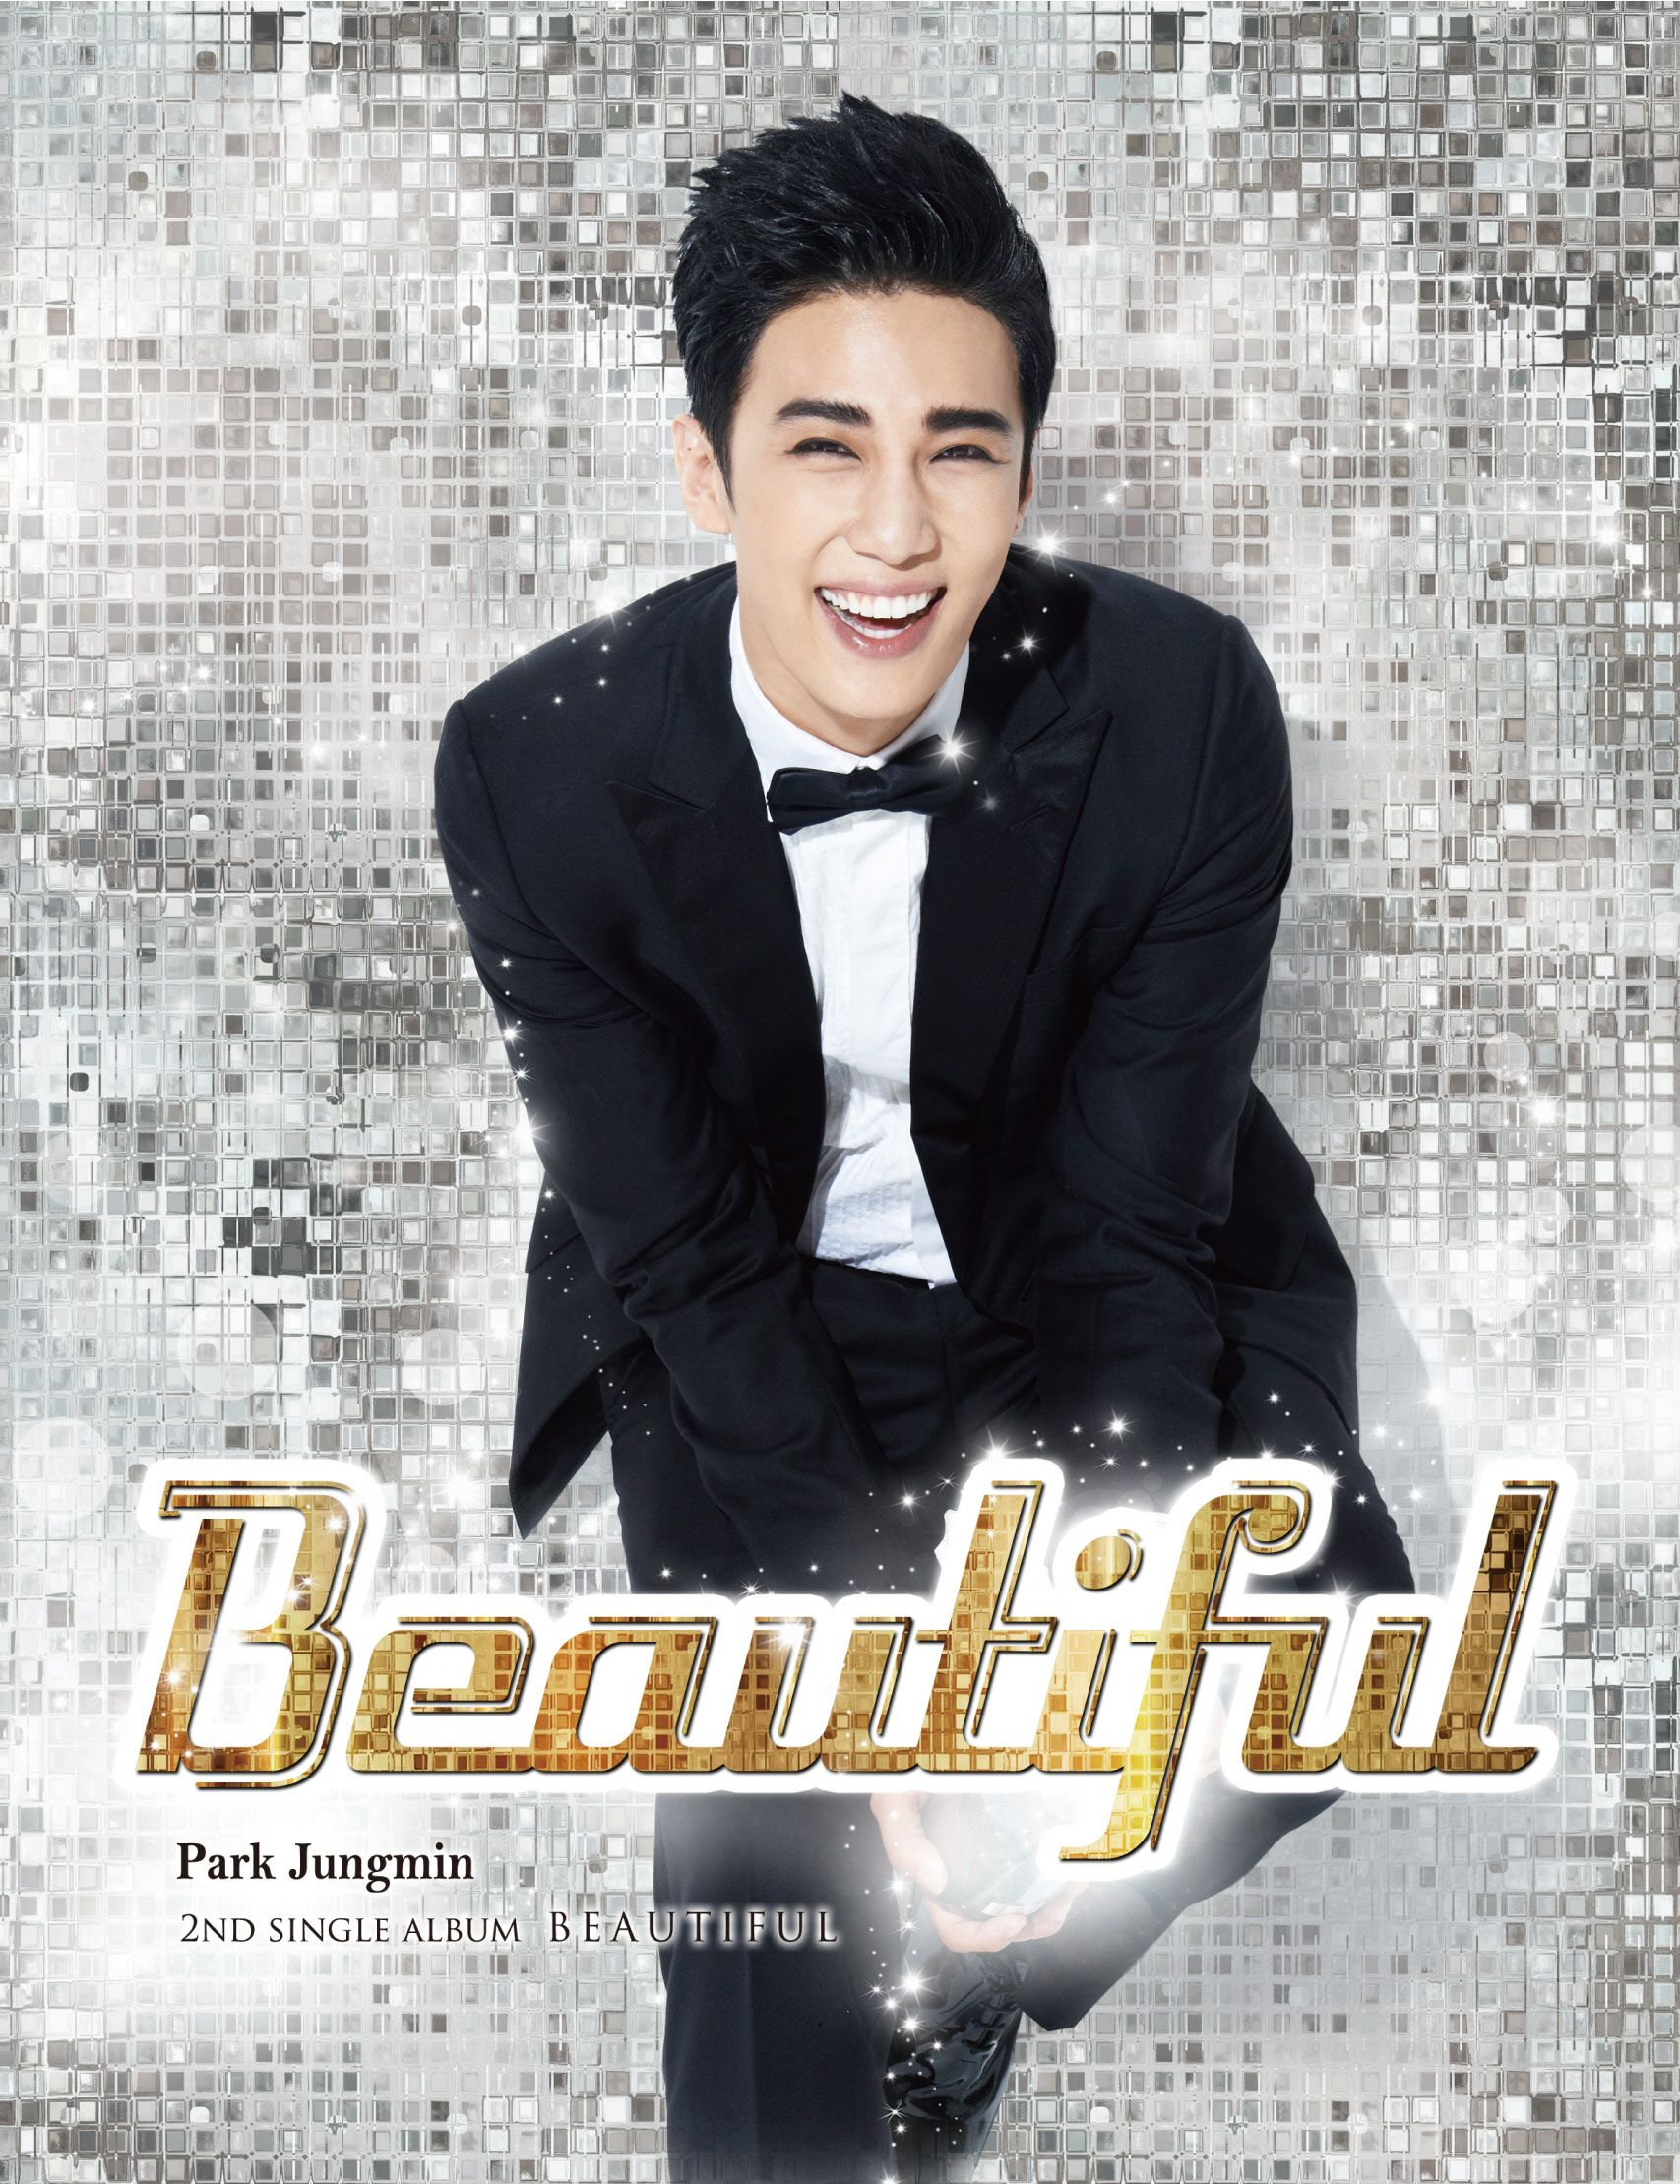 Park Jung Min [Single] – Beautiful [DESCARGA] Covernqa